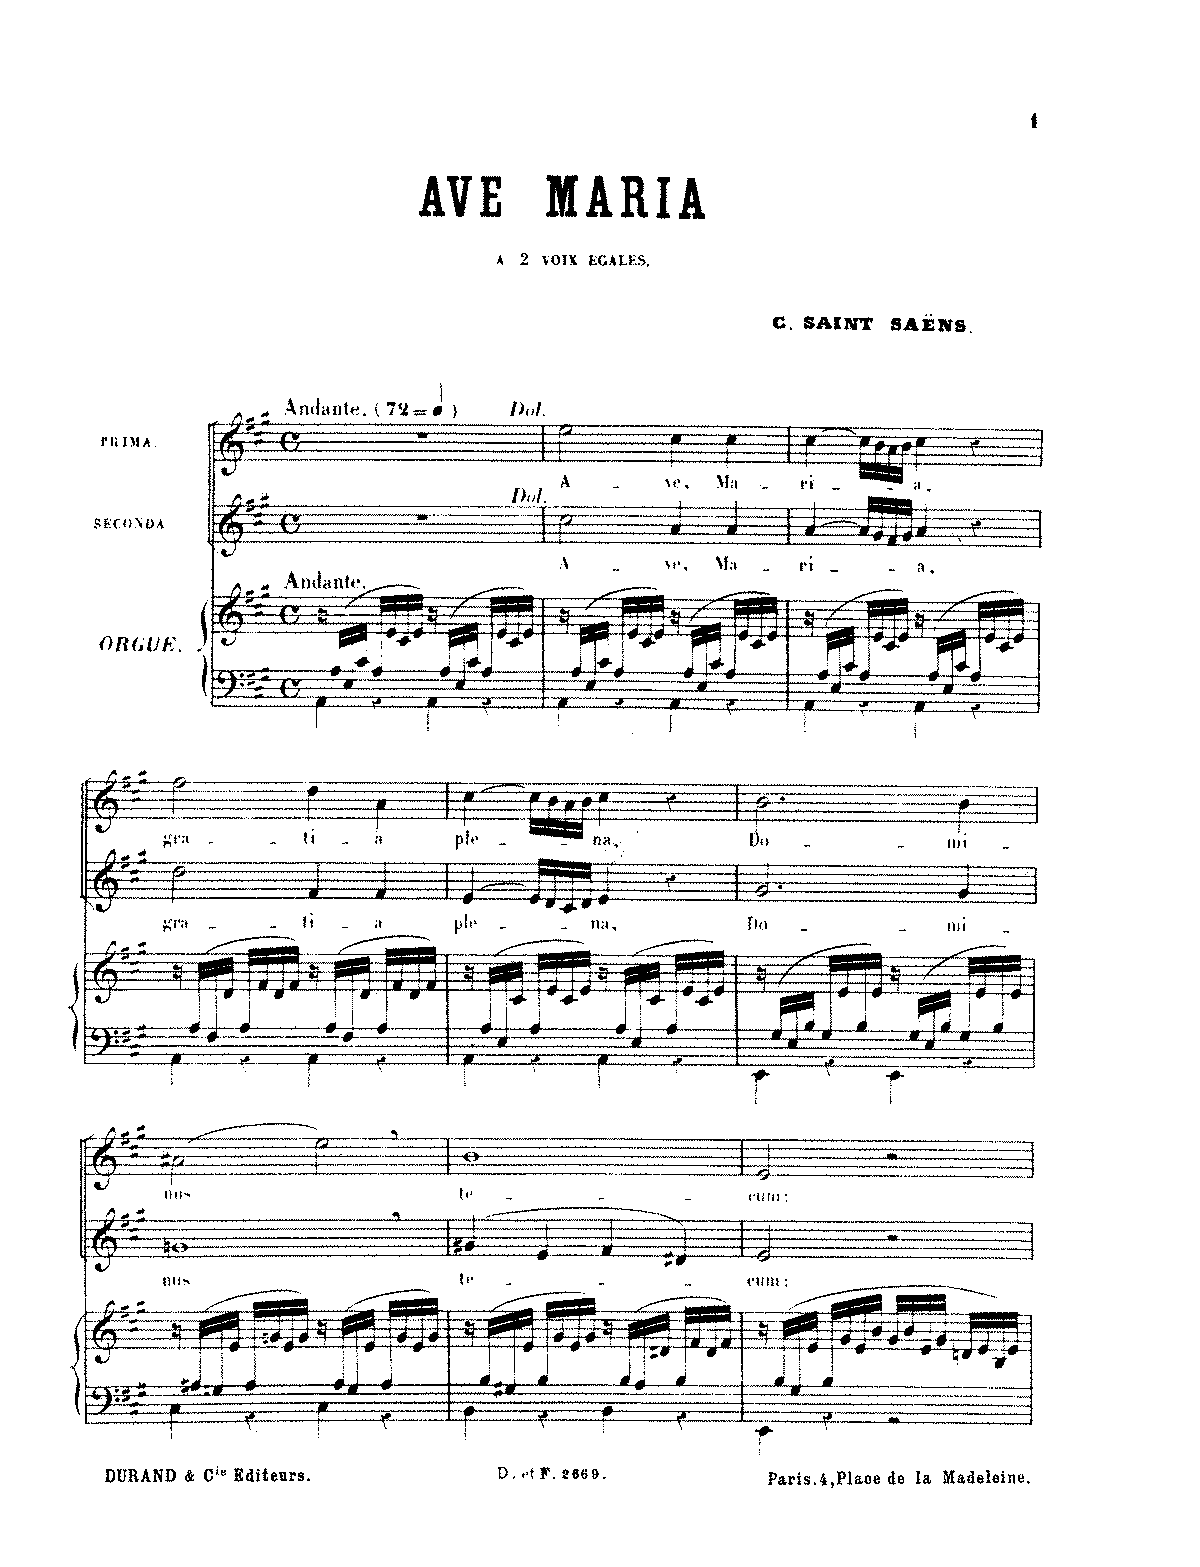 Ave maria in a major 1860 saint sans camille imslp arrangements and transcriptions hexwebz Images